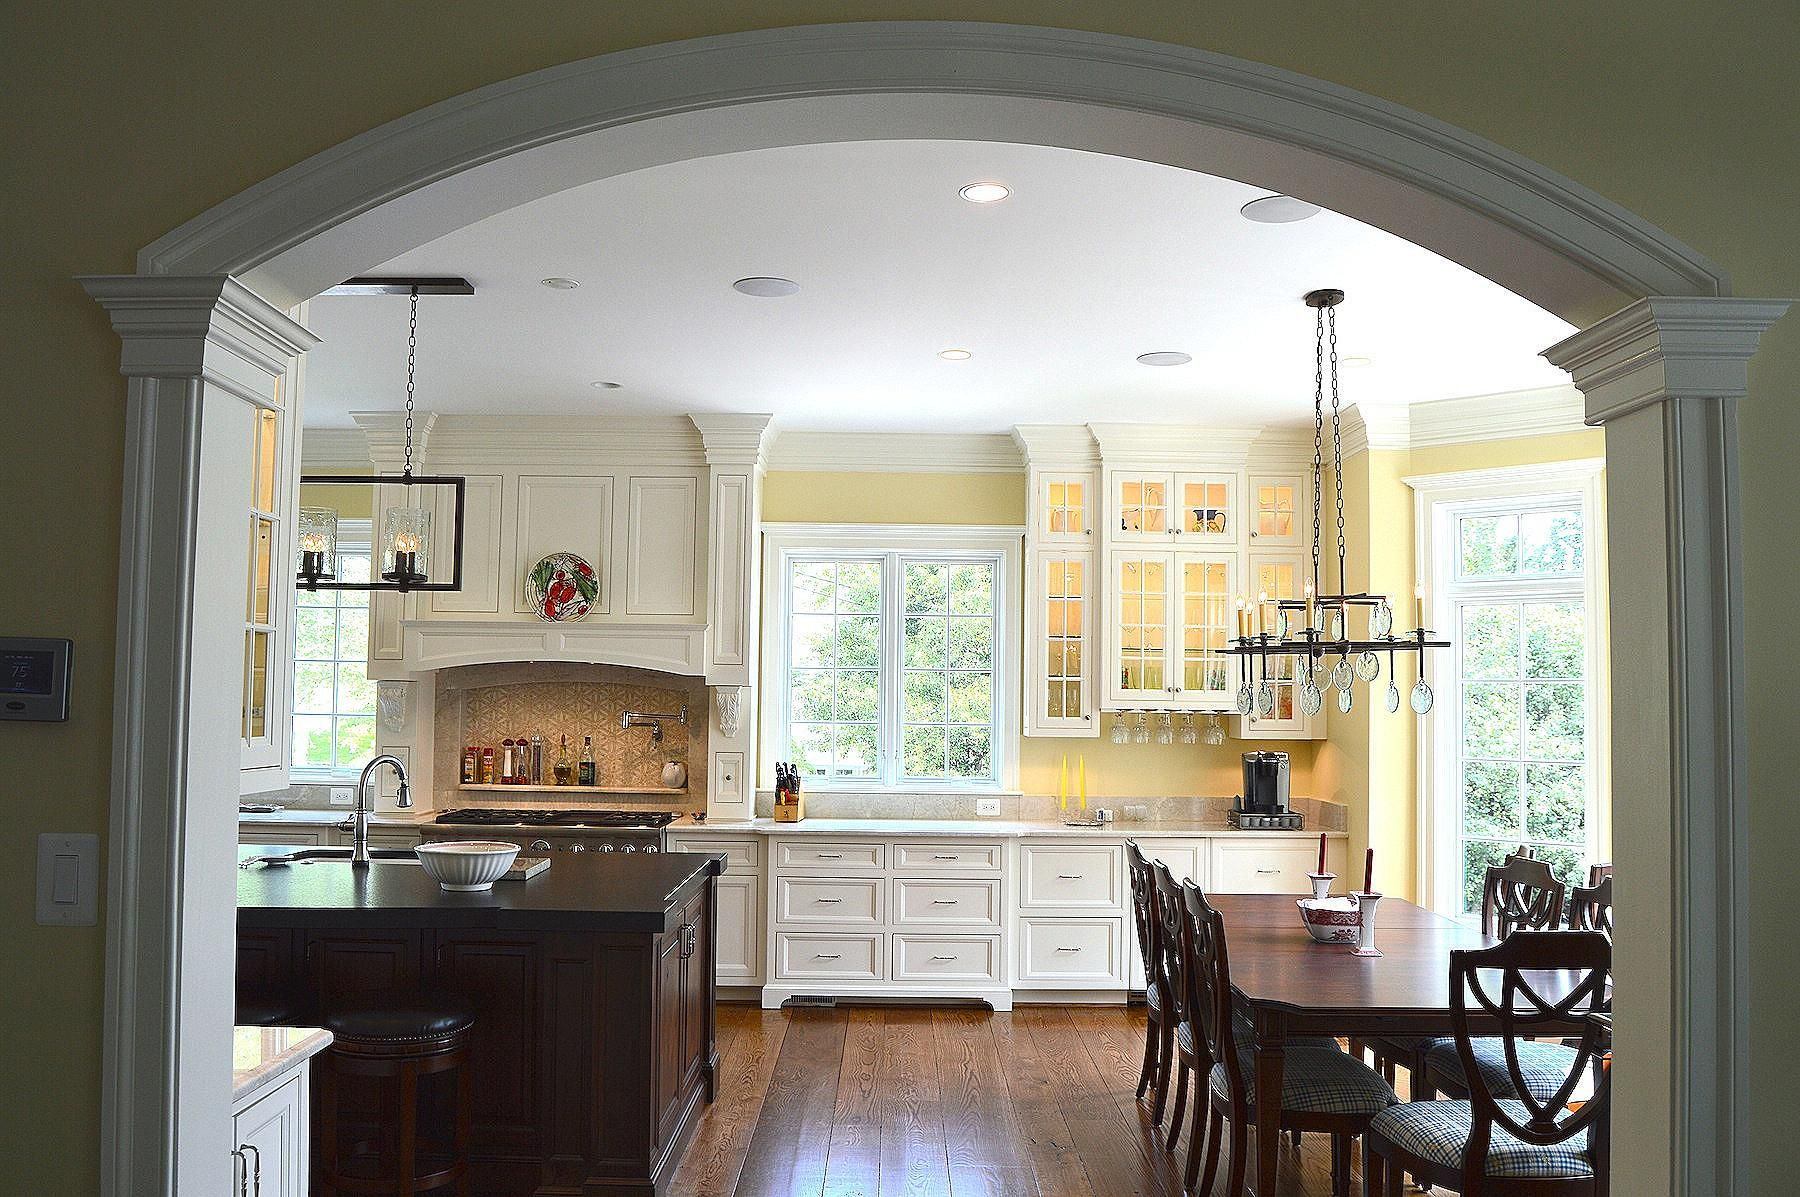 10 Unique Small Kitchen Design Ideas: Unique Kitchen Island Under 200